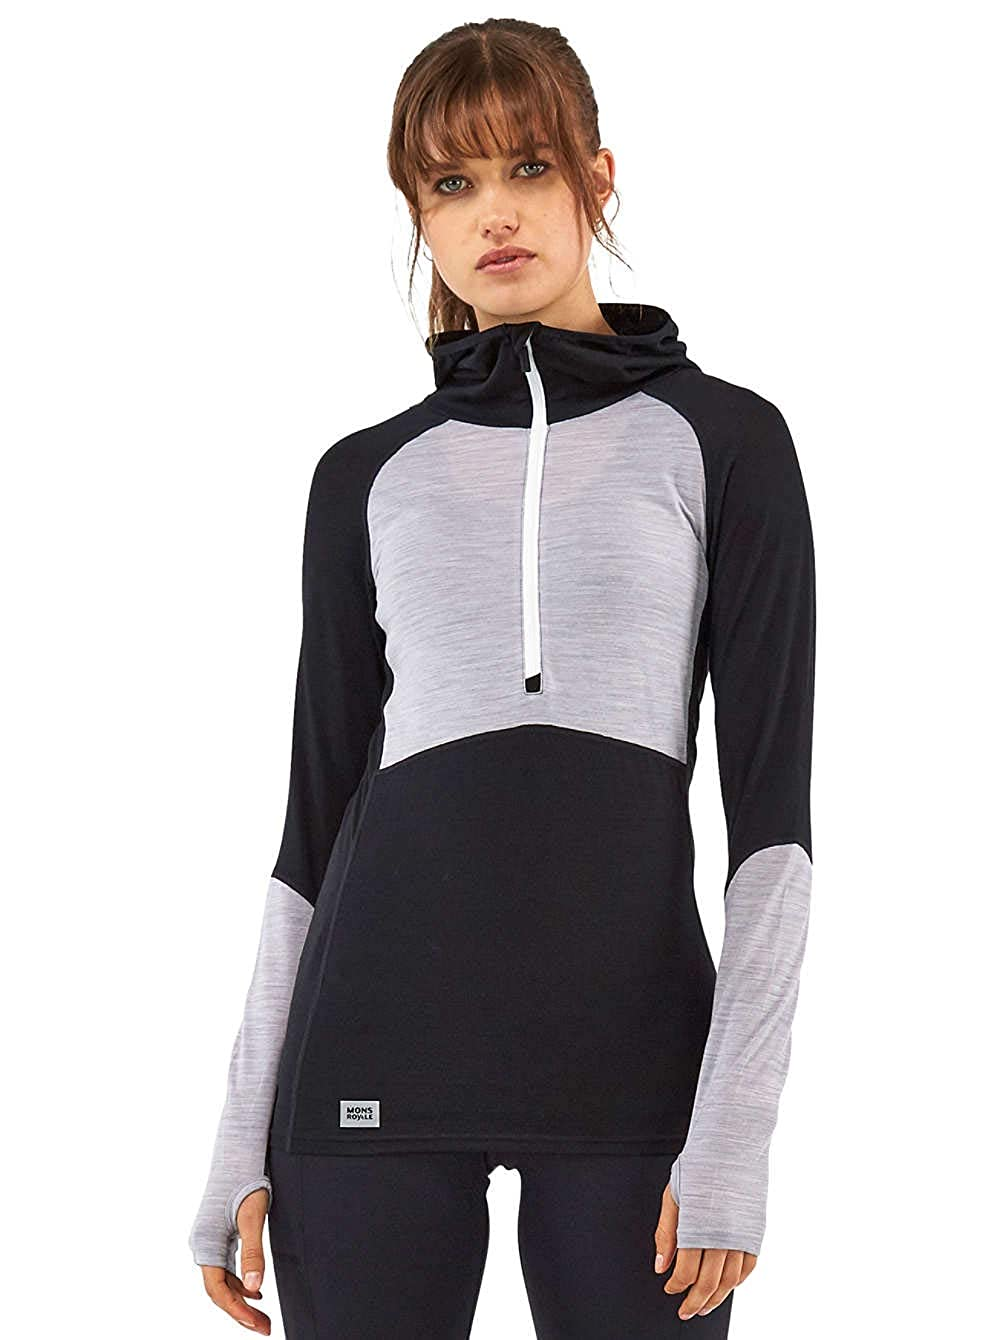 AW18 Mons Royale Bella Tech Womens Half Zip Hooded Top